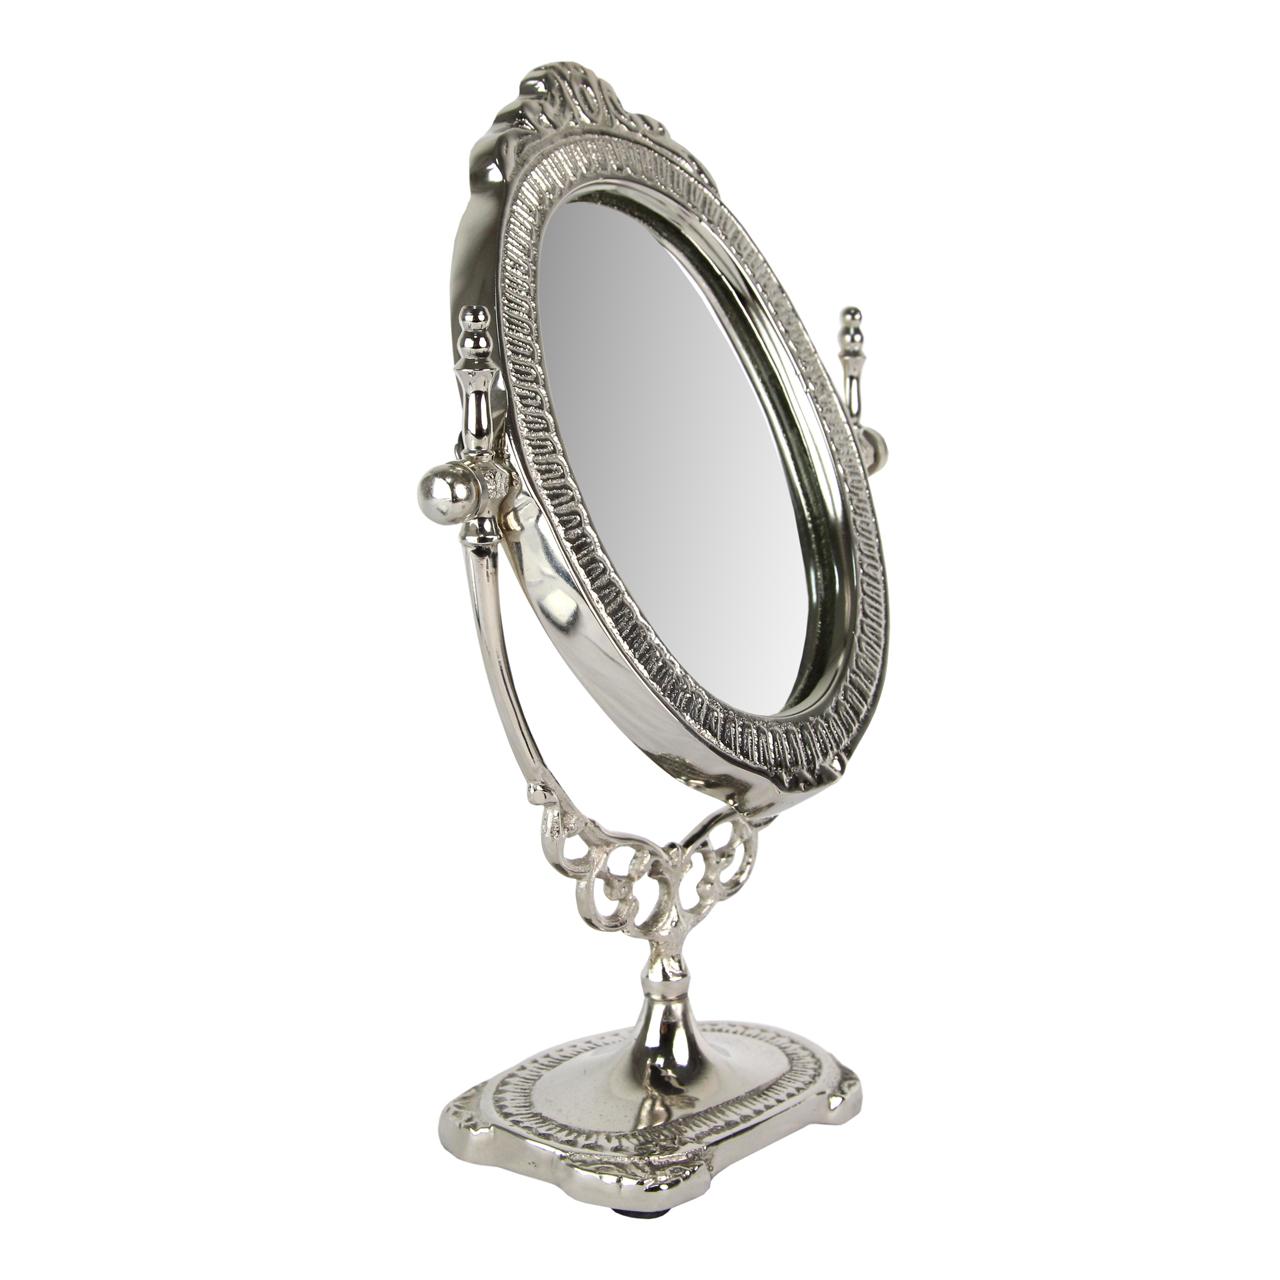 Oglinda Cu Picior Din Metal Argintiu 25x17 Cm